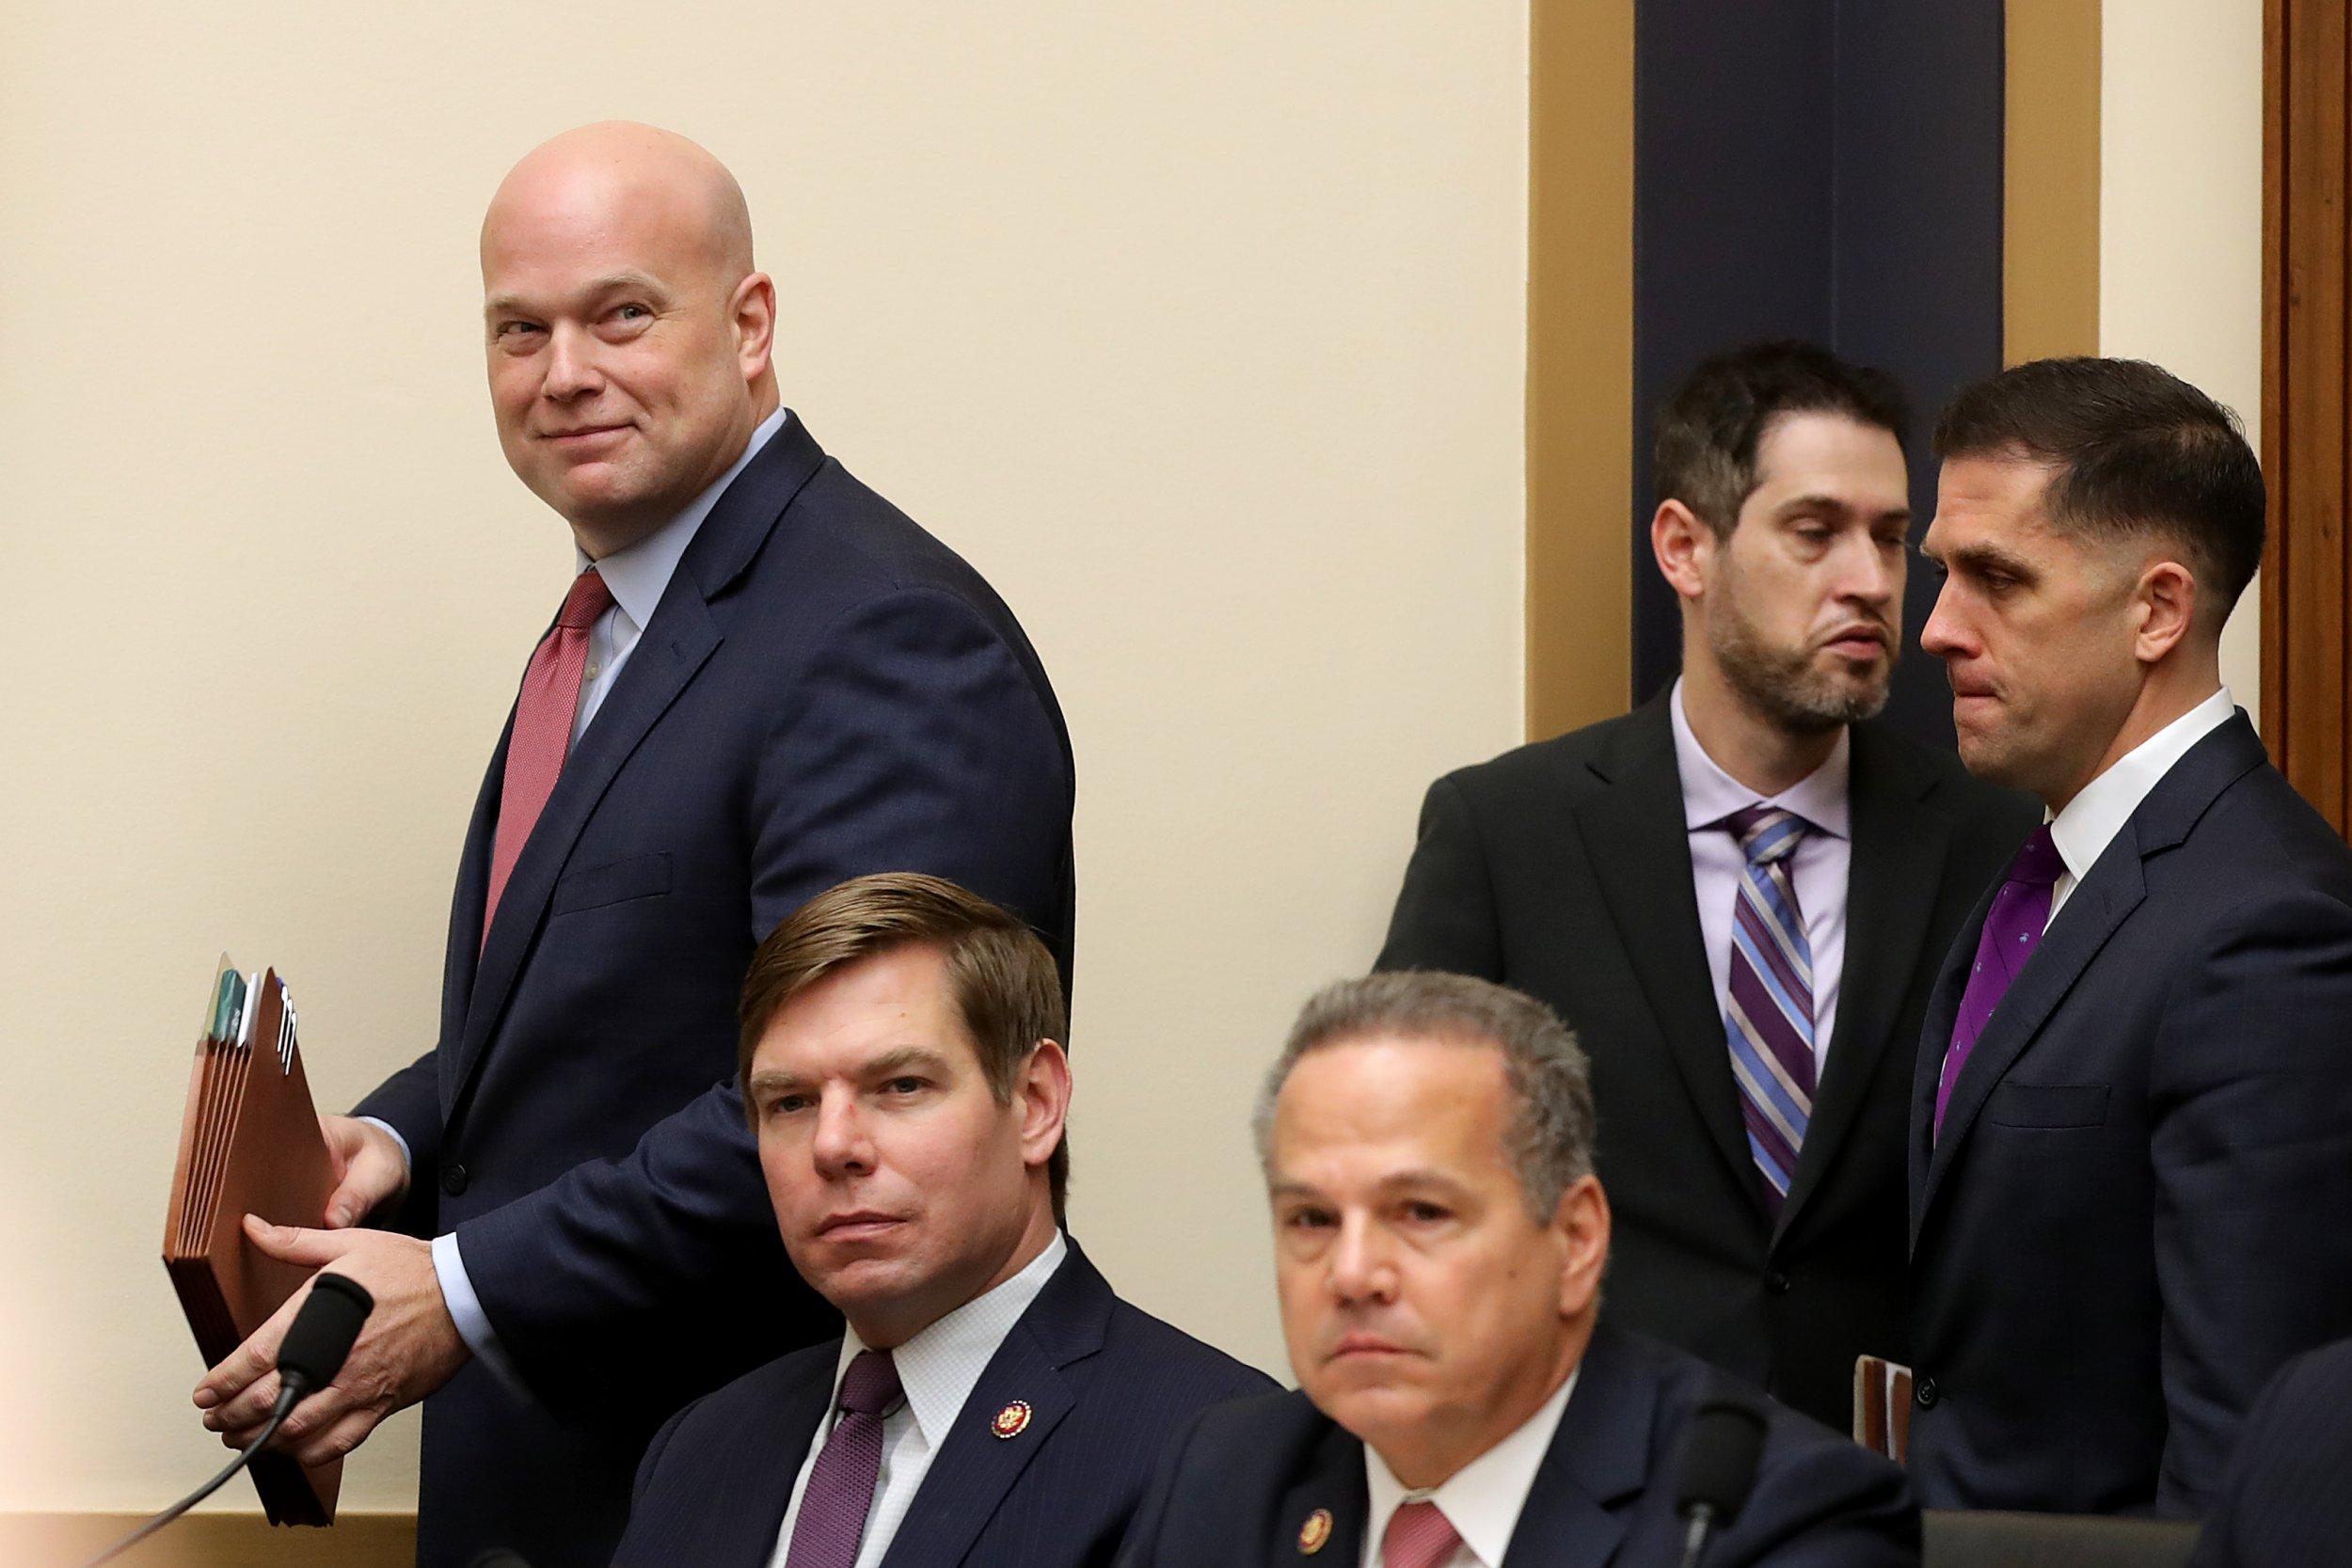 whitaker, democrat, jackson, lee, humor